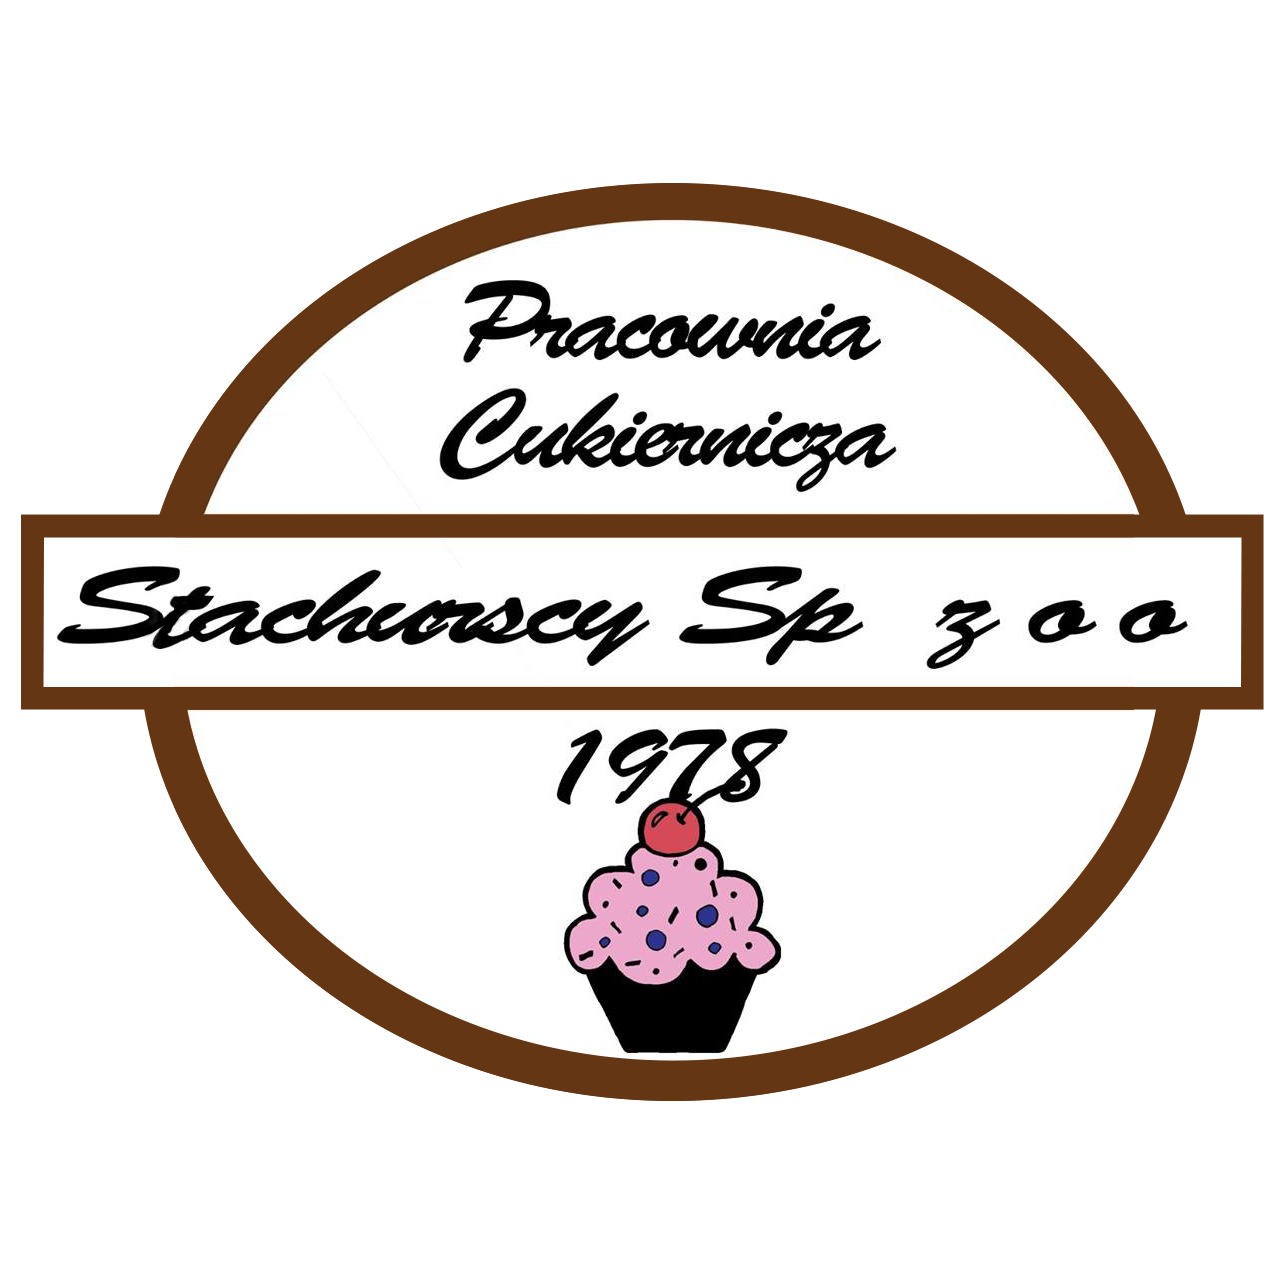 Kawiarnia-Cukiernia Stachurscy